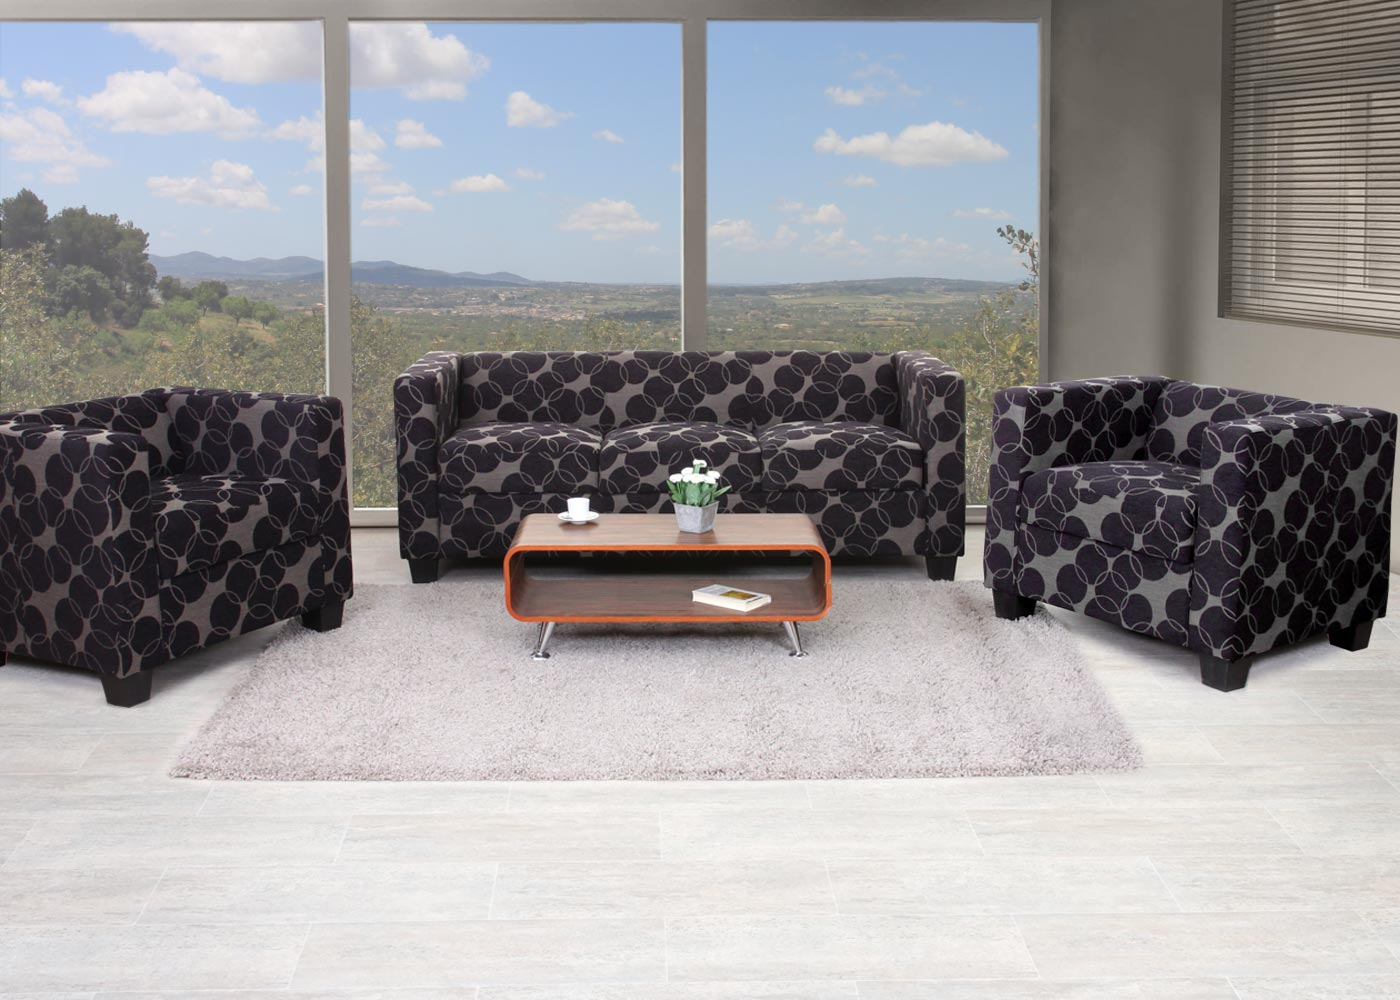 3 1 1 sofagarnitur couchgarnitur loungesofa lille textil grau schwarz. Black Bedroom Furniture Sets. Home Design Ideas